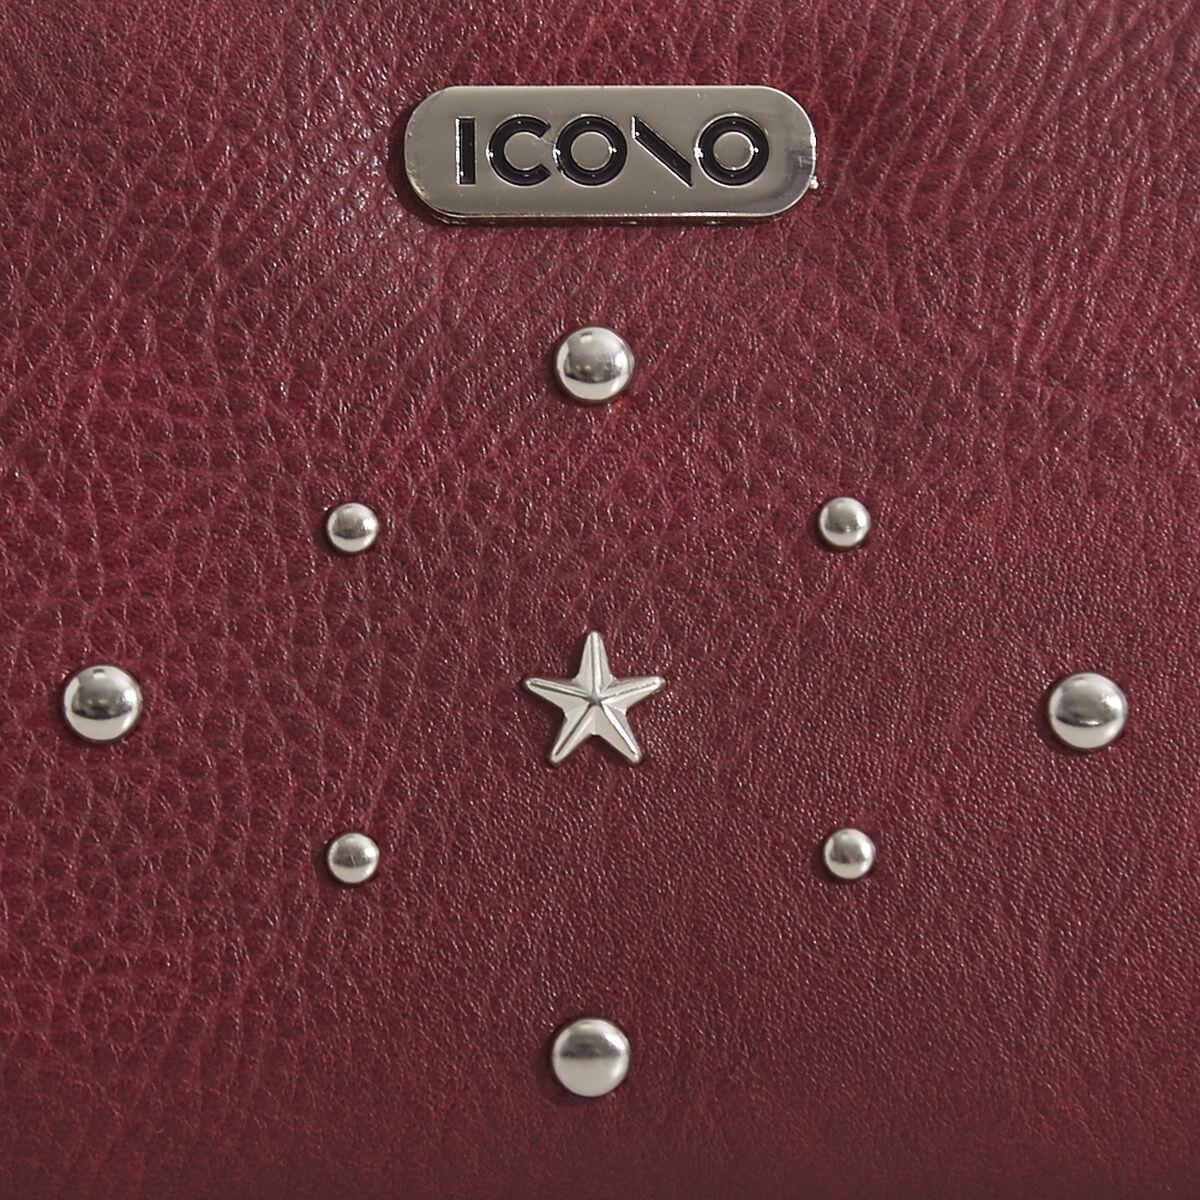 Billetera Mujer Icono